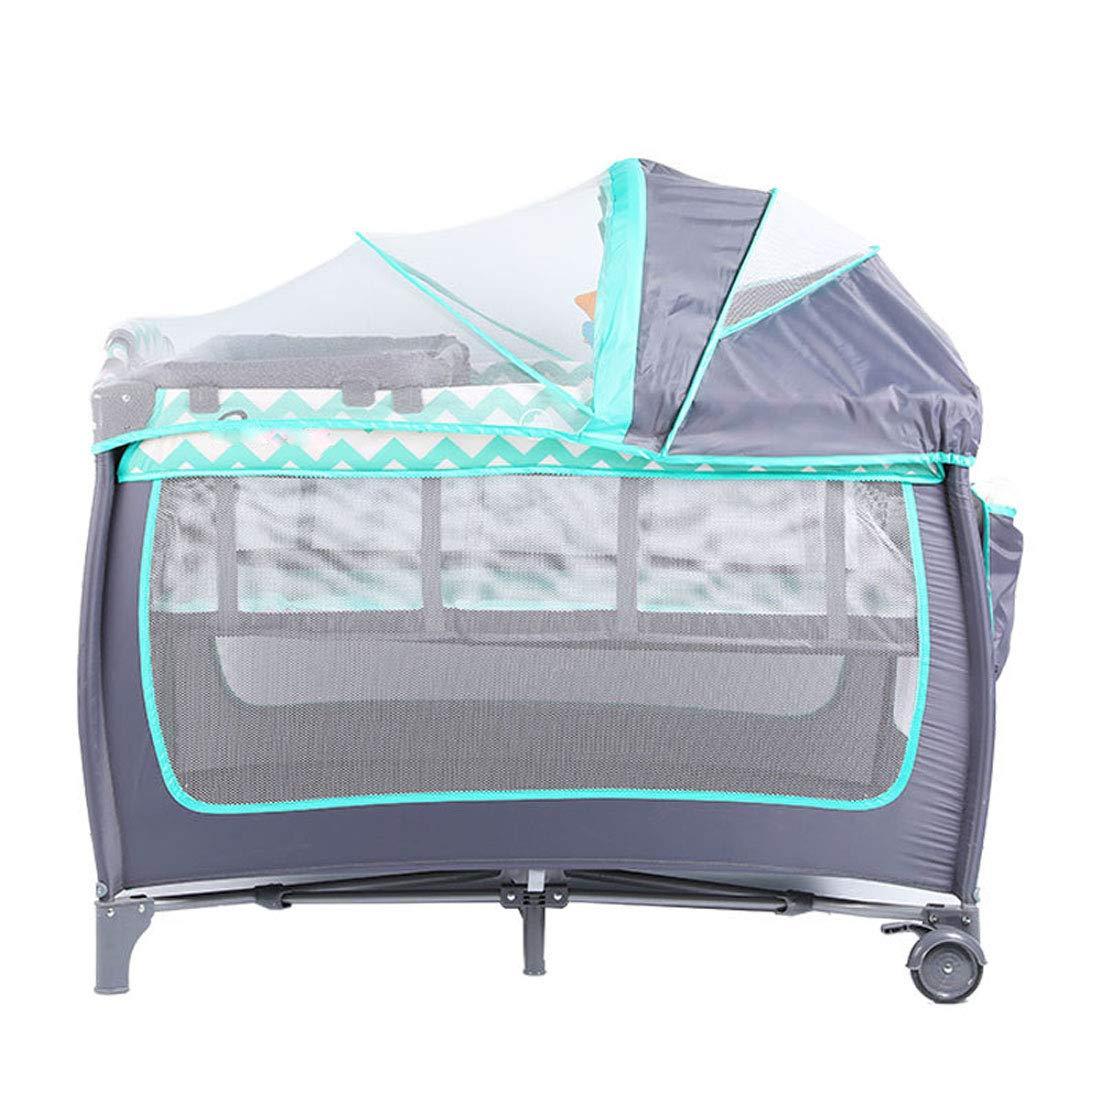 Amazon.com: RZJ-Puzzle Baby Crib Grey Toys Changing Table ...